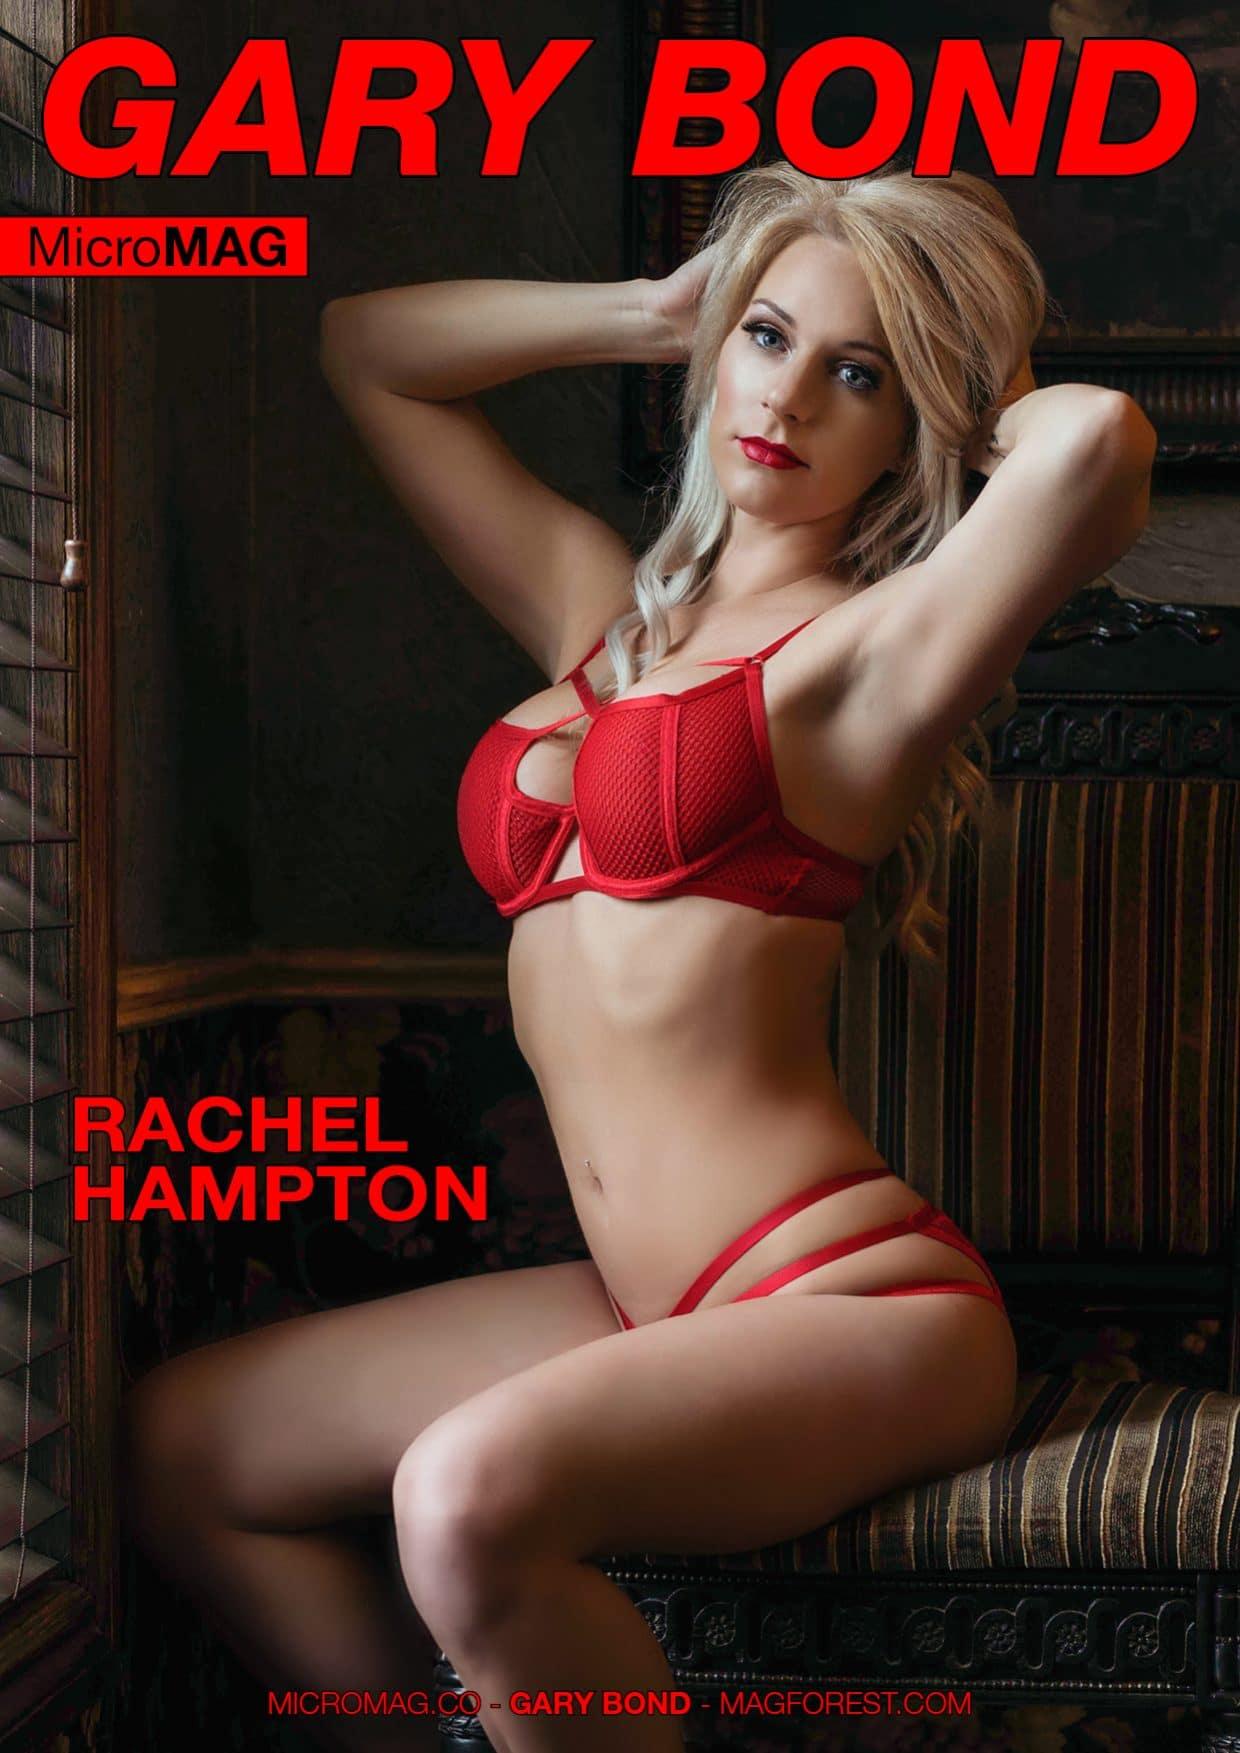 Gary Bond MicroMAG - Rachel Hampton 1